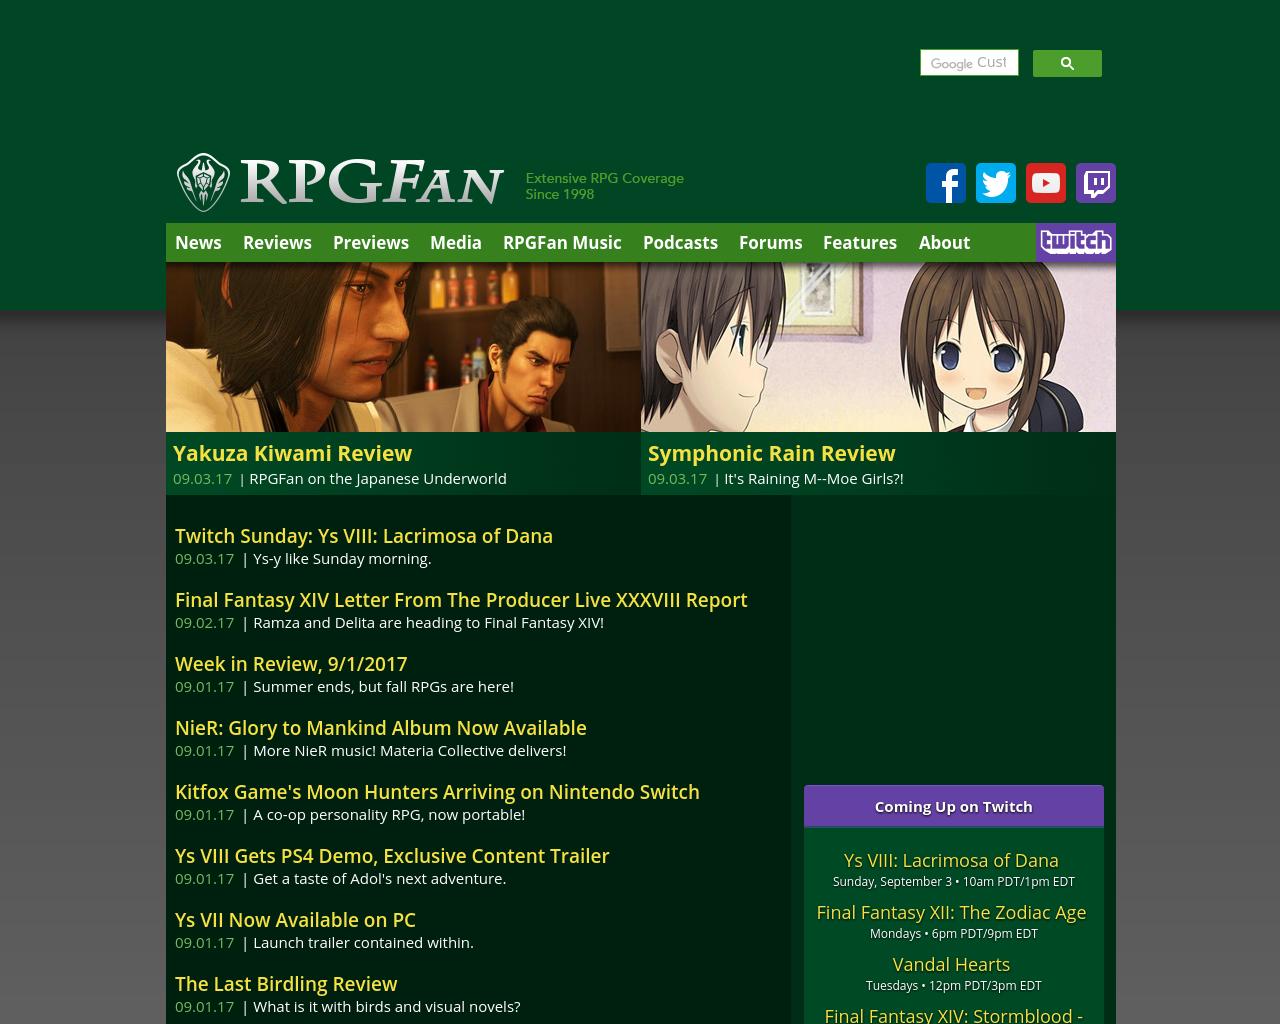 RPGFan-Advertising-Reviews-Pricing